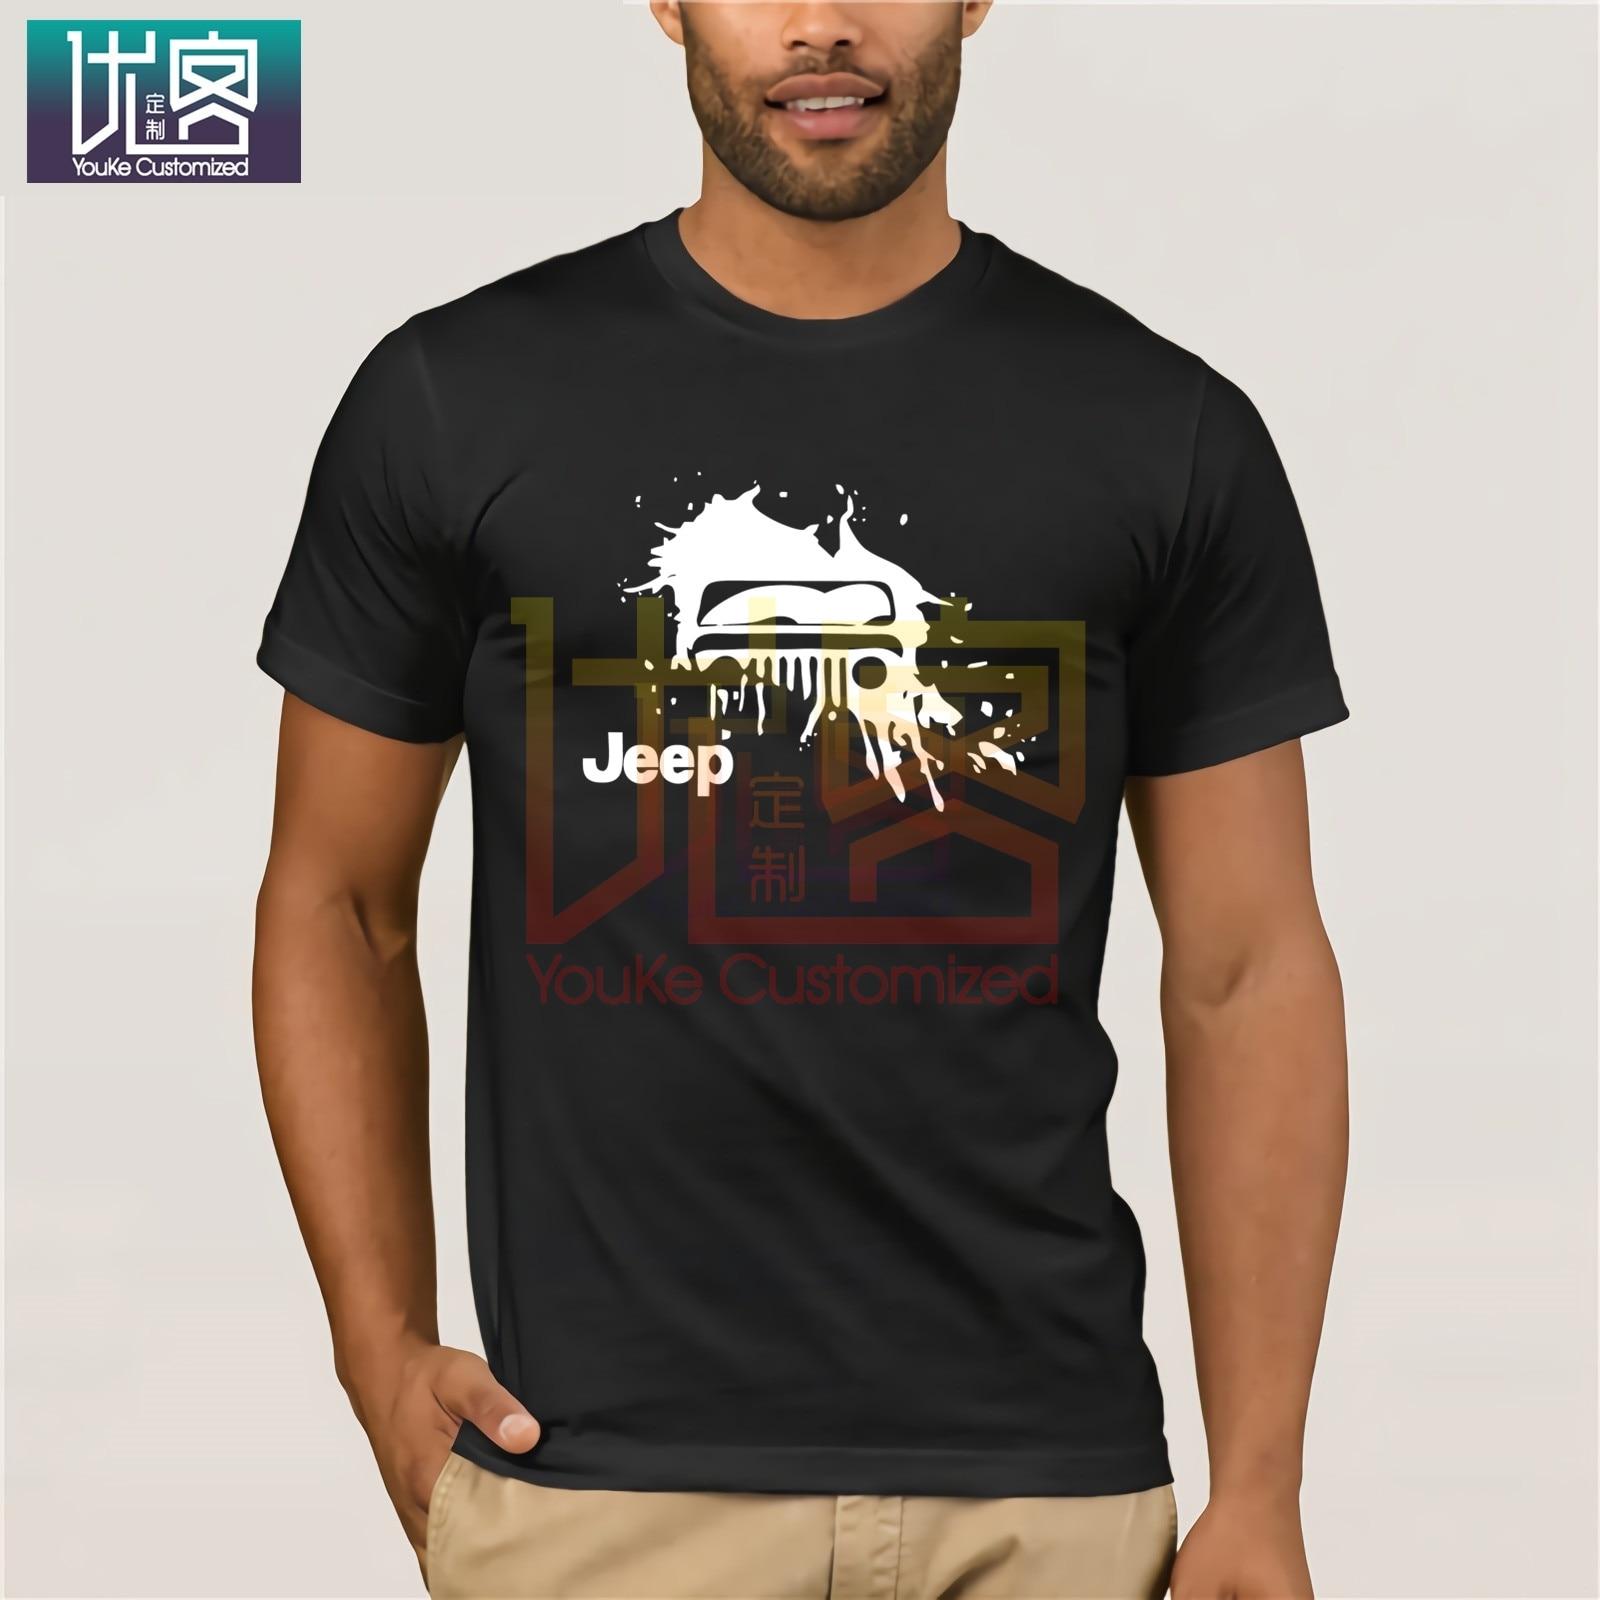 Moda 2020, gran oferta, Jeeps American Car Cj7 Splash Land Cruiser, camiseta 4x4, camiseta a la moda para hombres, envío gratis, camiseta para hombres, Tops